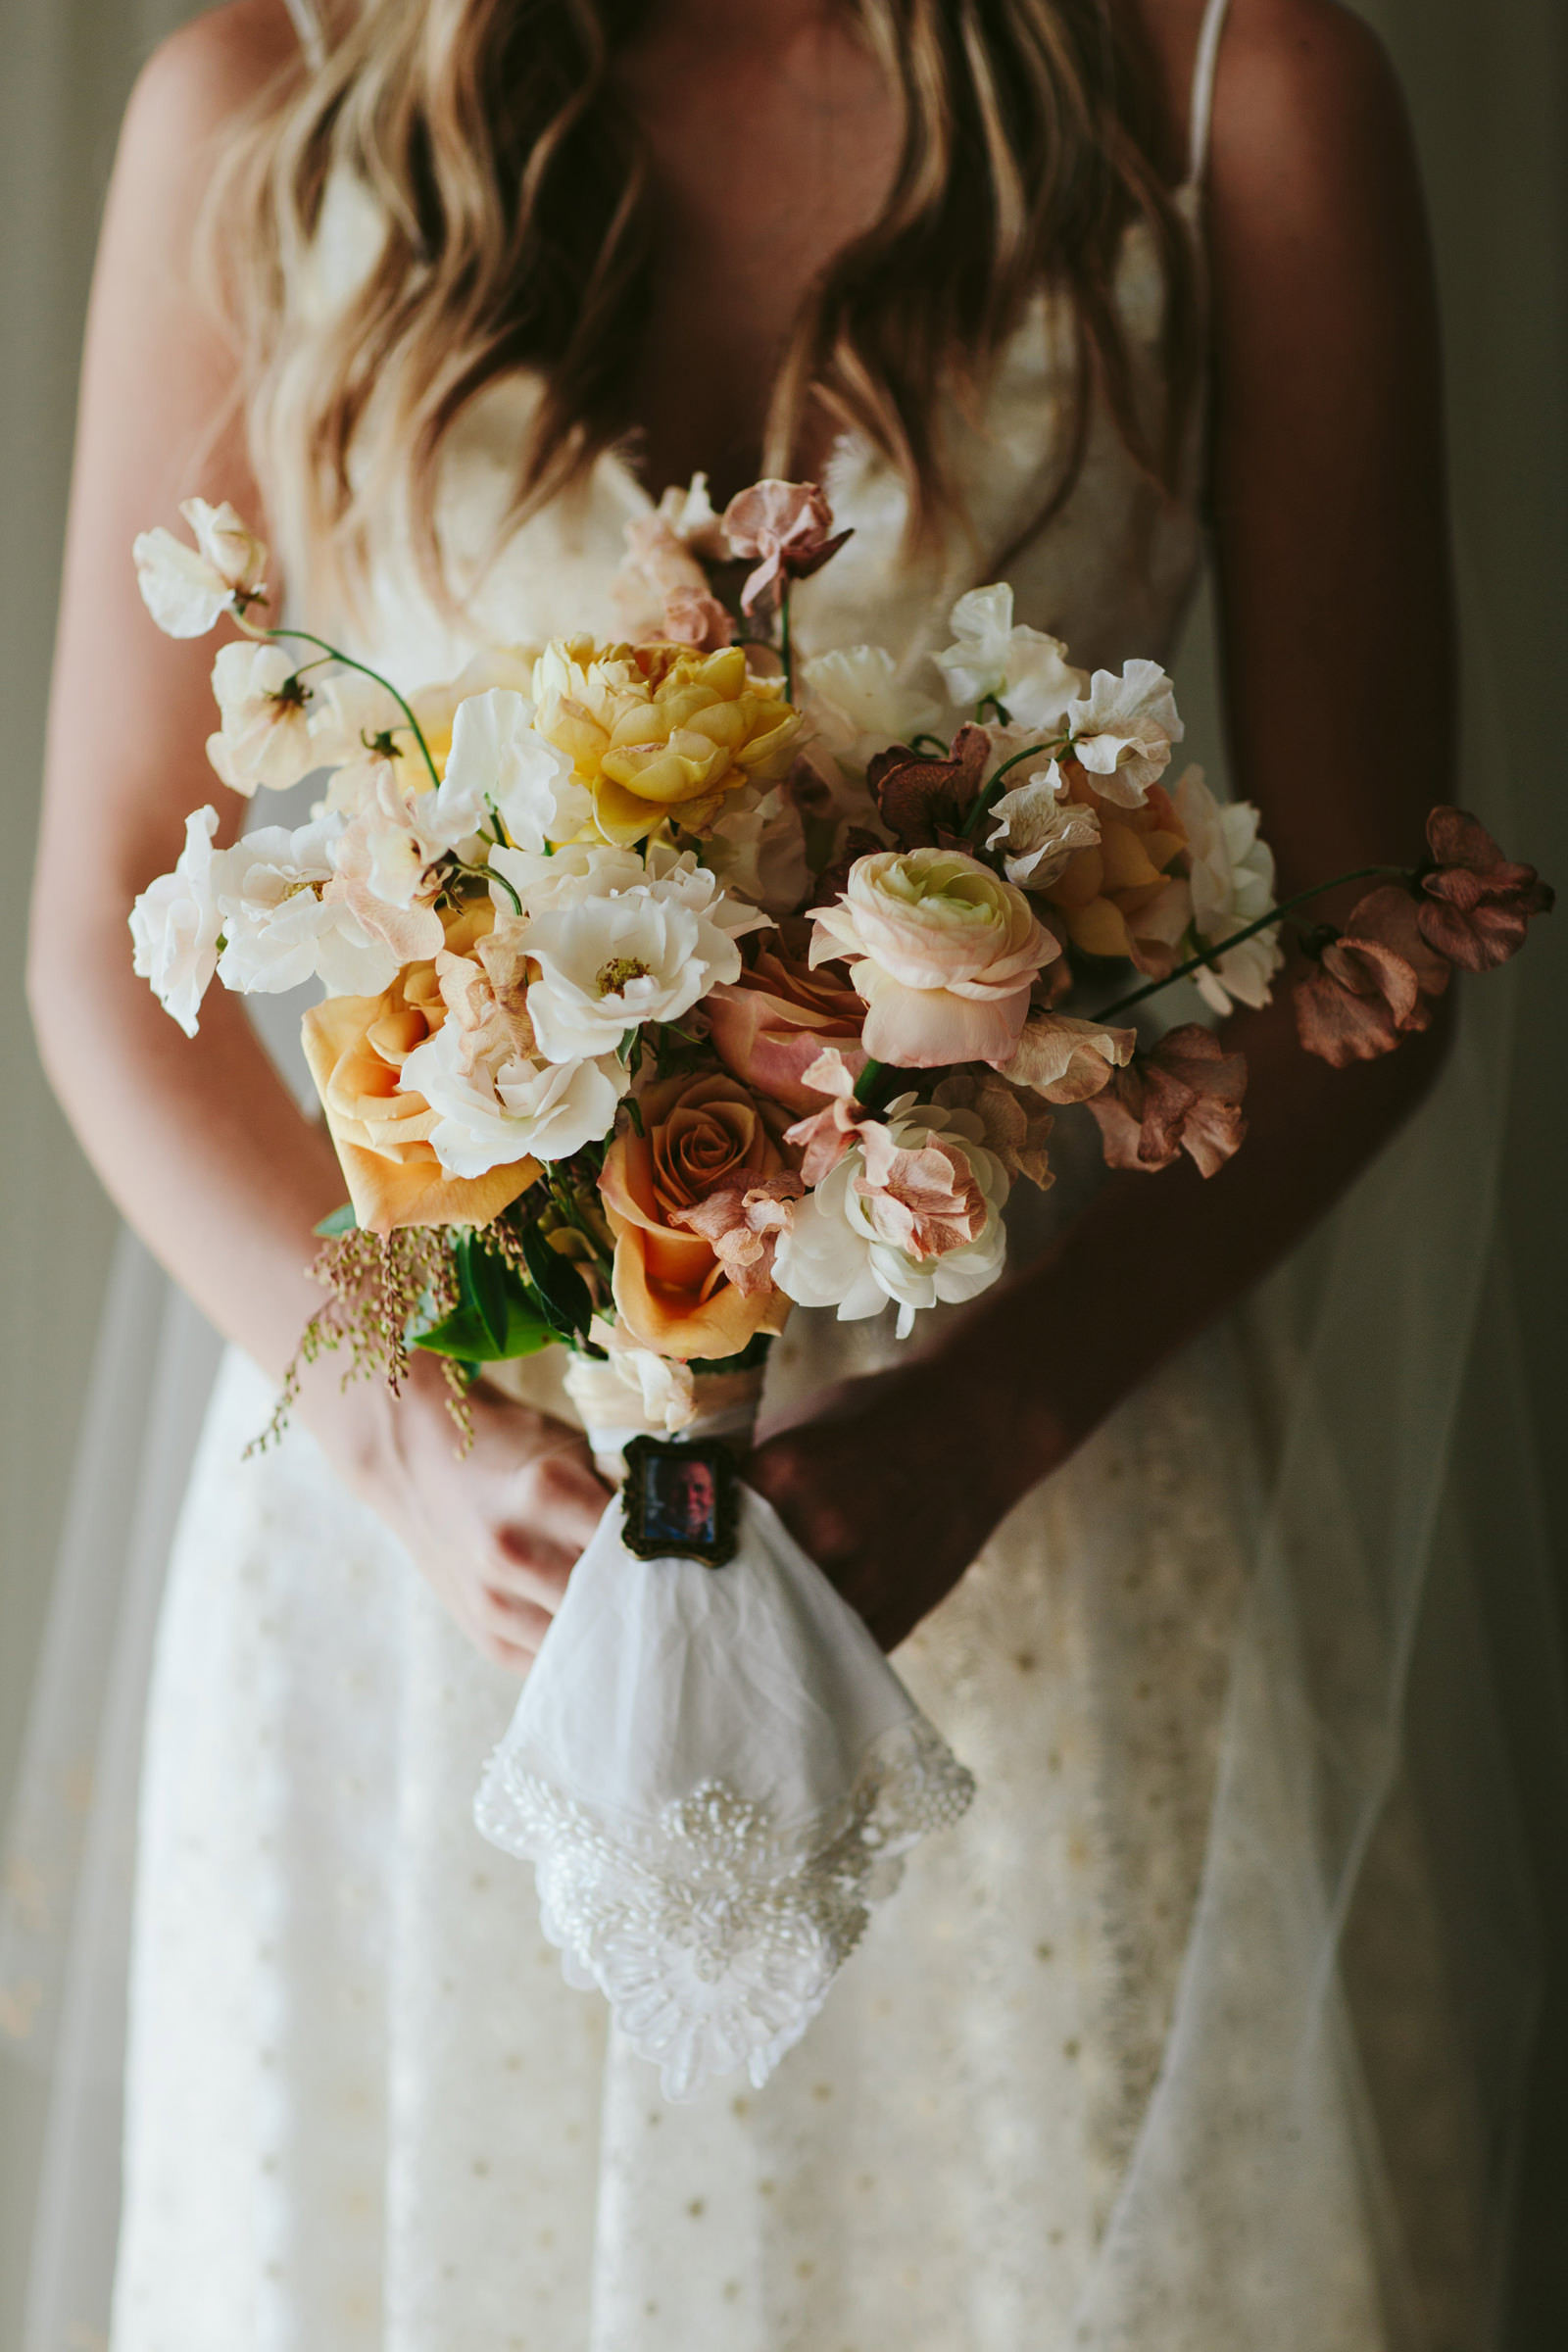 bride-holding-bouquet-melia-lucida